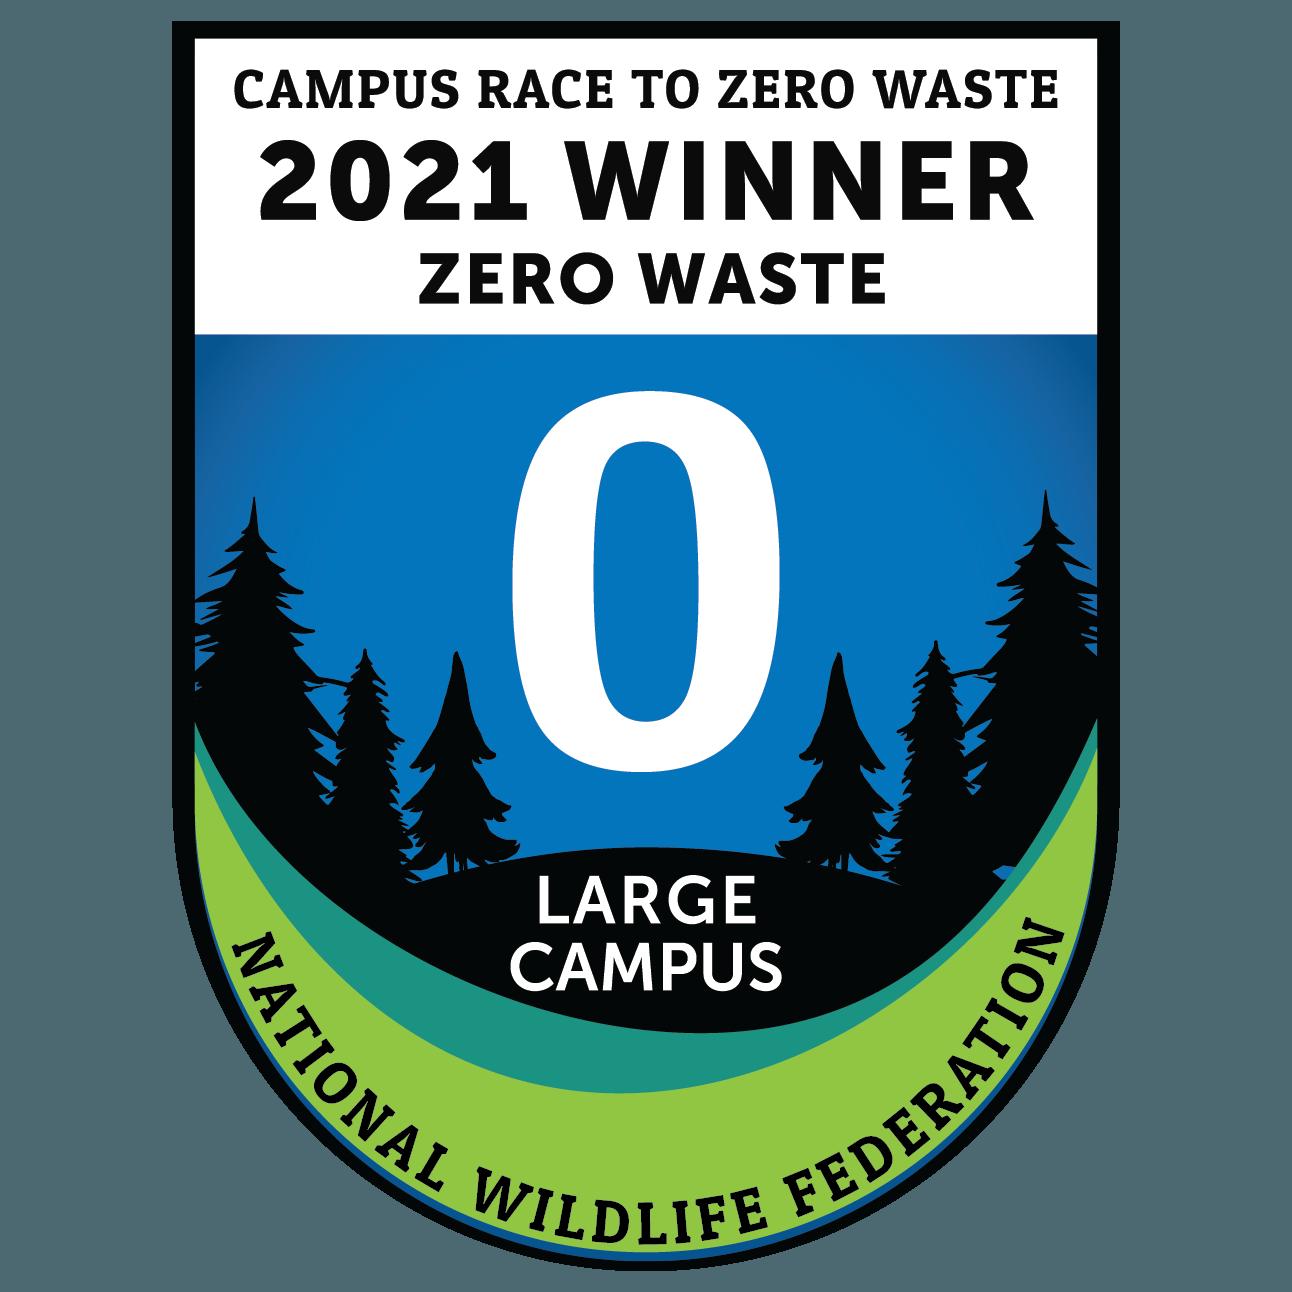 Kent State won the Campus Race to Zero Waste Large Campus Award